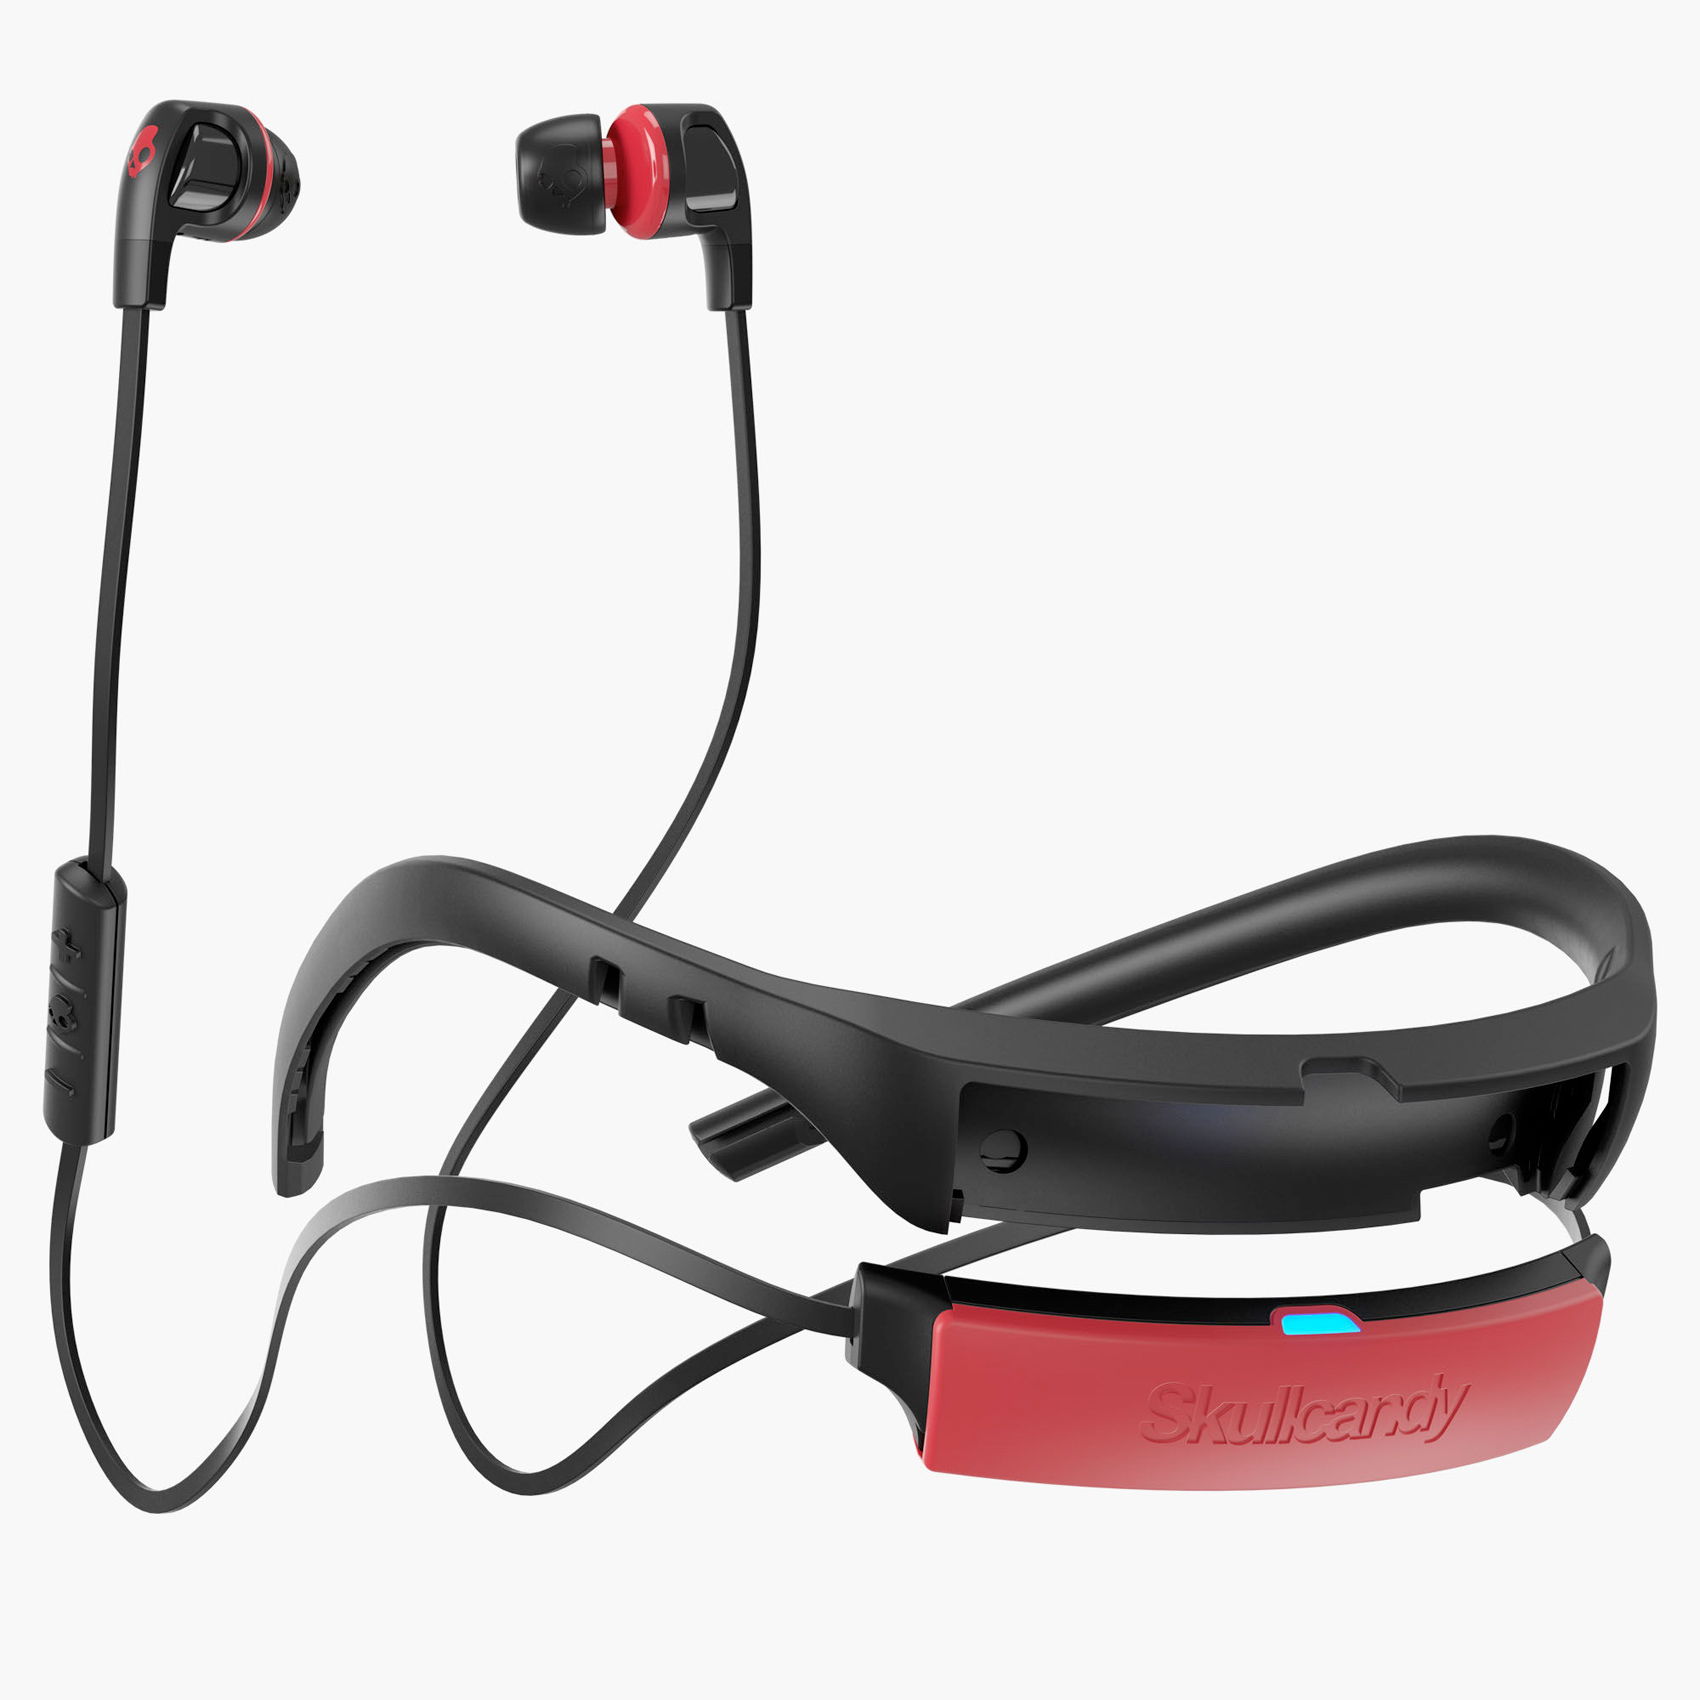 skullcandy bluetooth headphones smokin bud 2 wireless ear buds microphone ebay. Black Bedroom Furniture Sets. Home Design Ideas